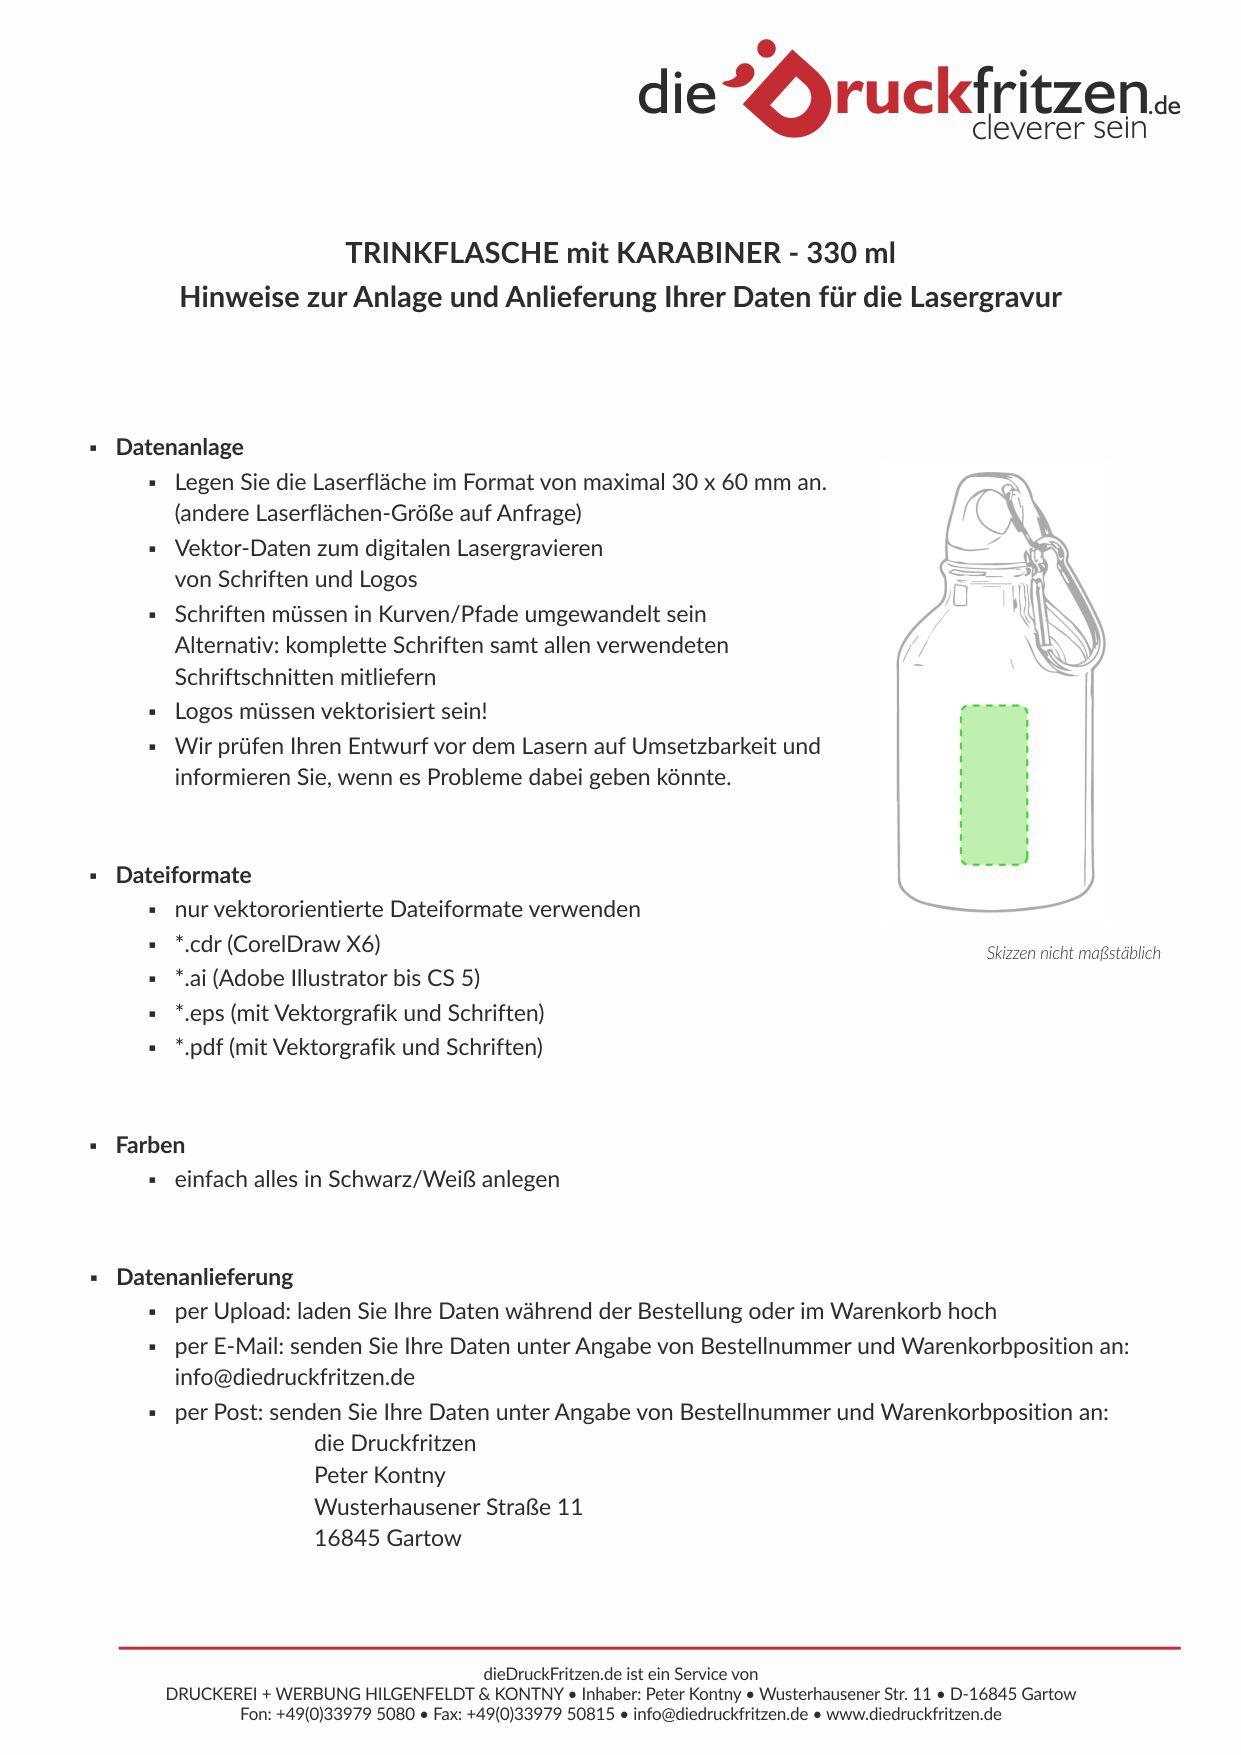 dieDruckfritzen_Datenblatt_Trinkflasche-Karabiner-330ml_Laser